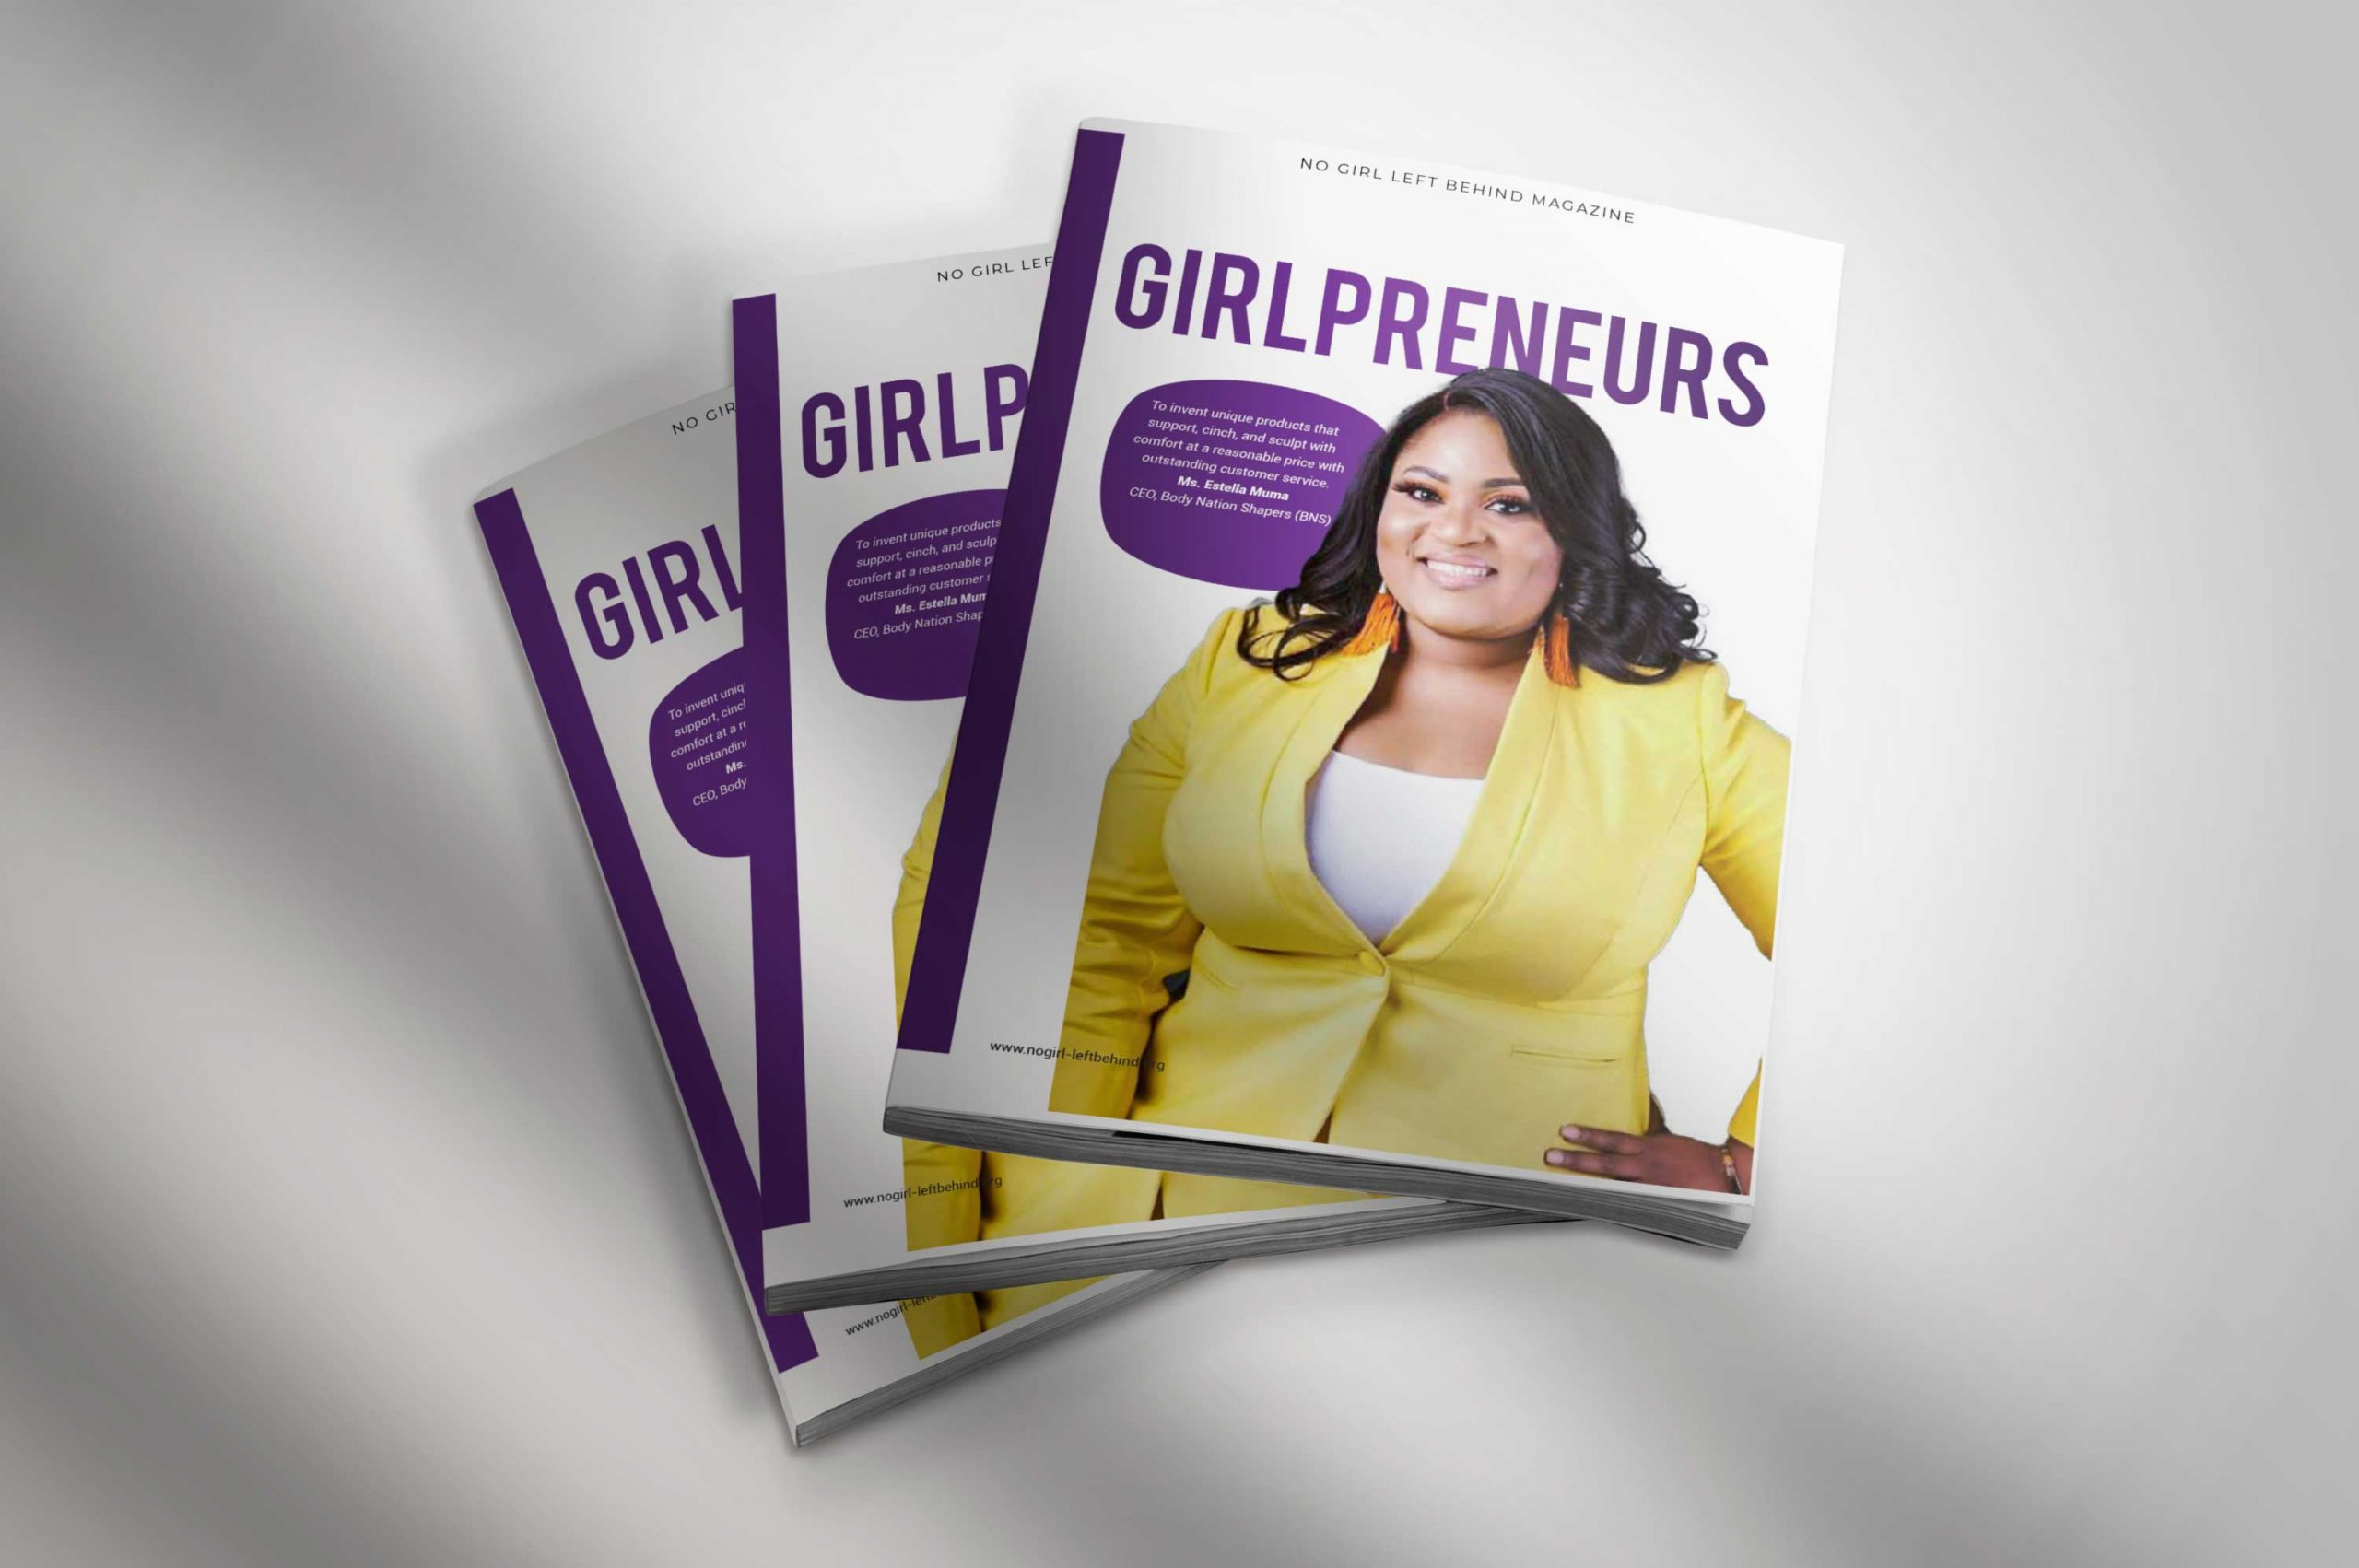 The Girl Magazine Vol. 3